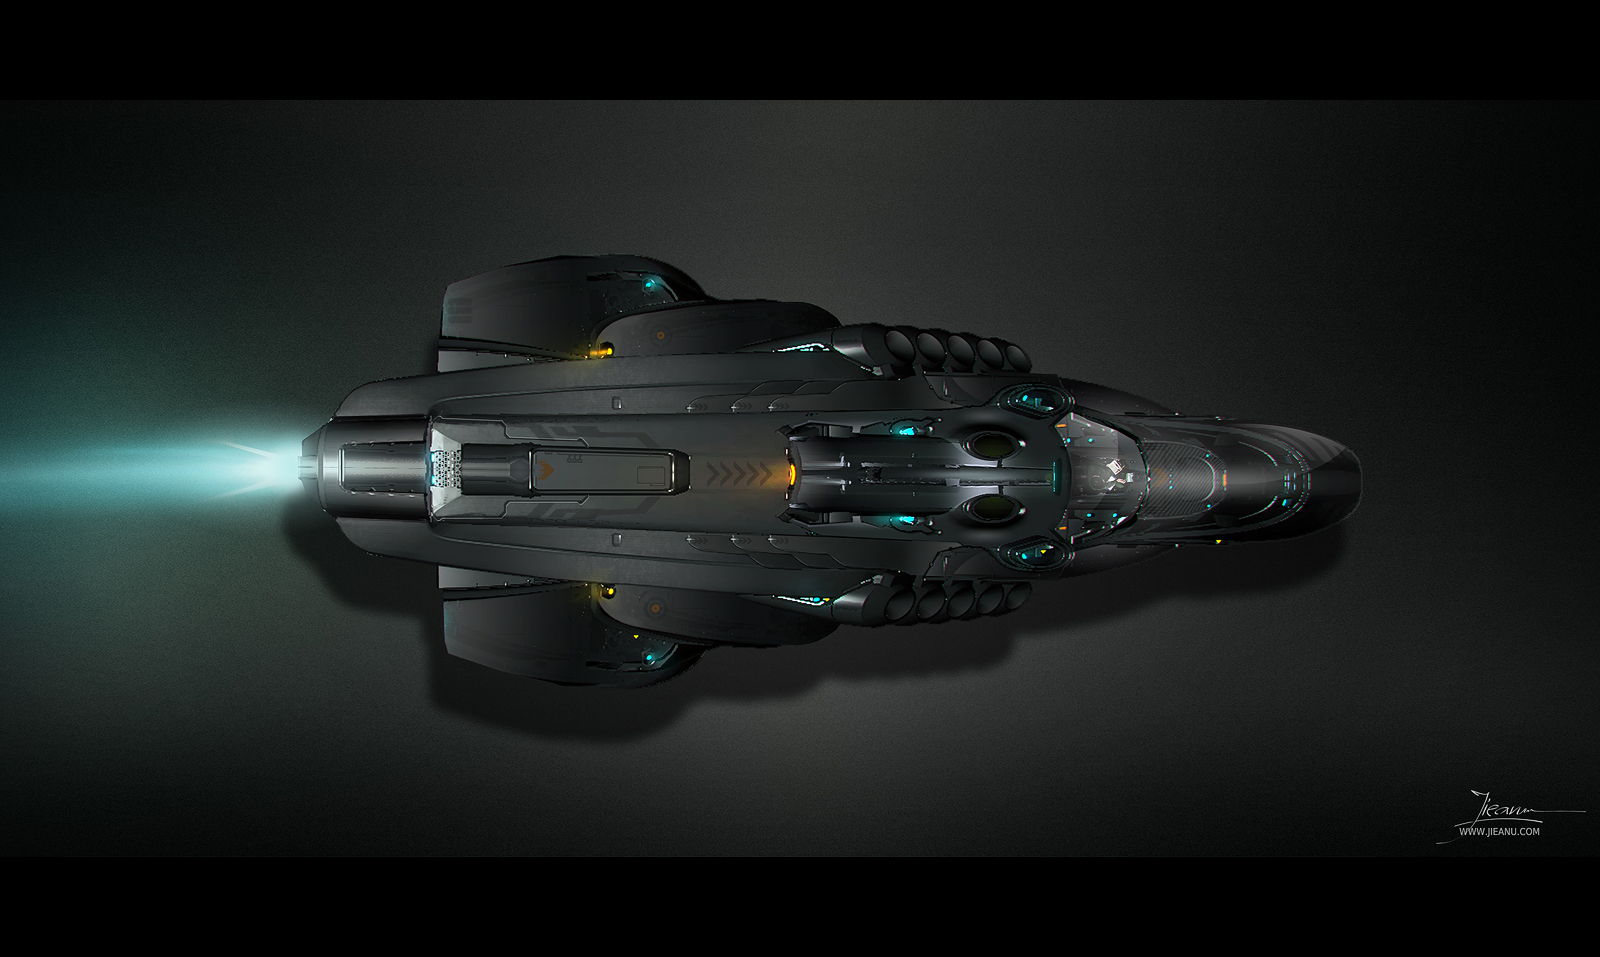 spacecraft concept - photo #29